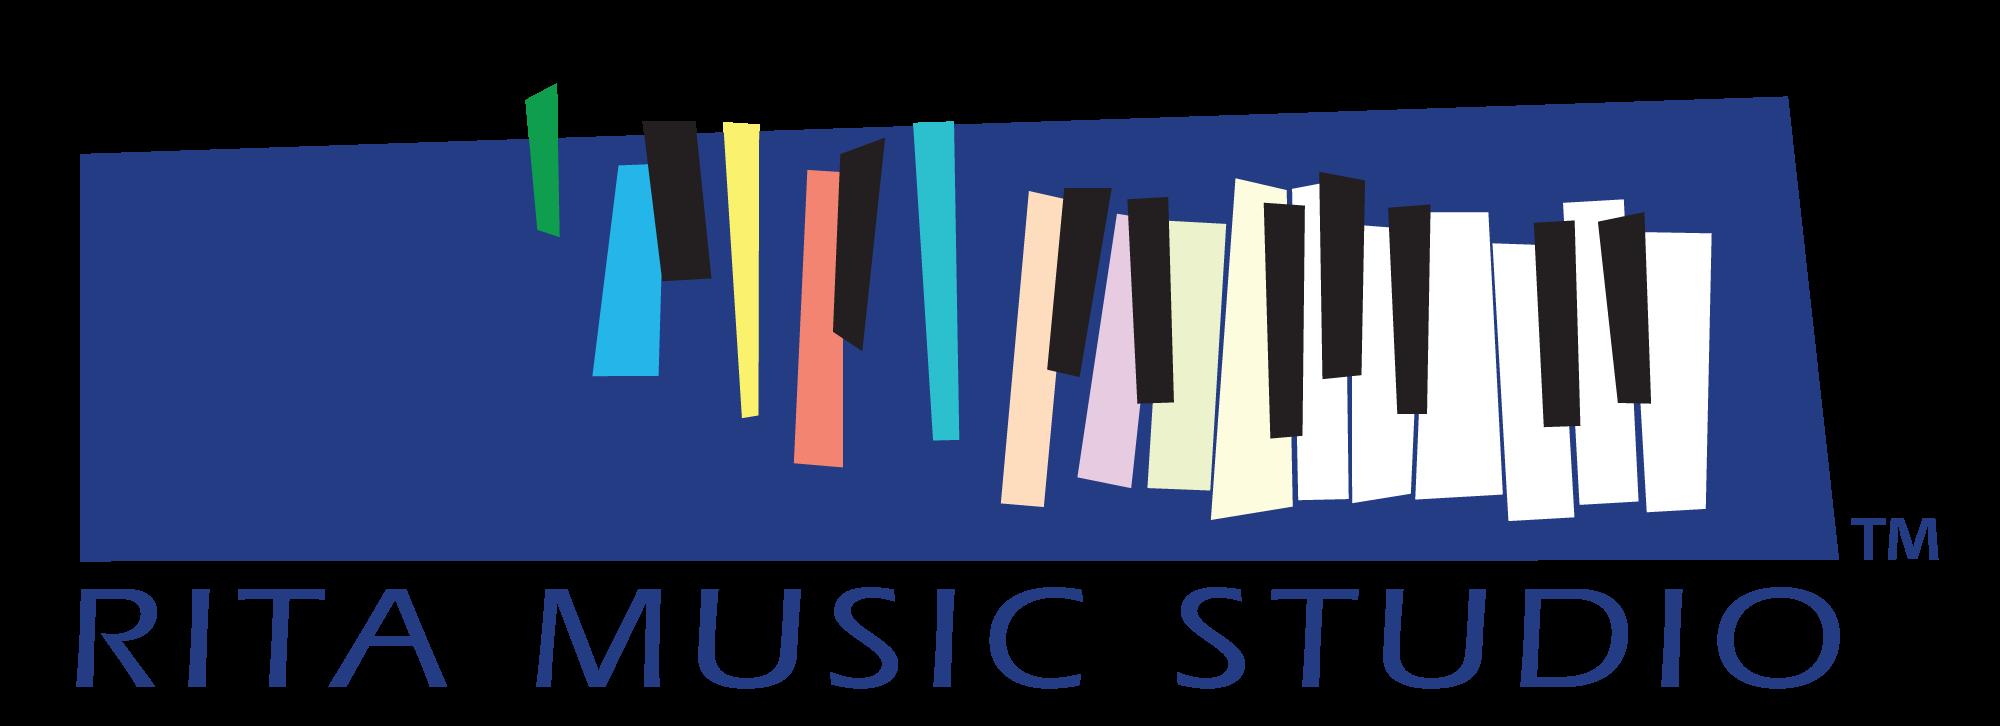 Rita Music Studio